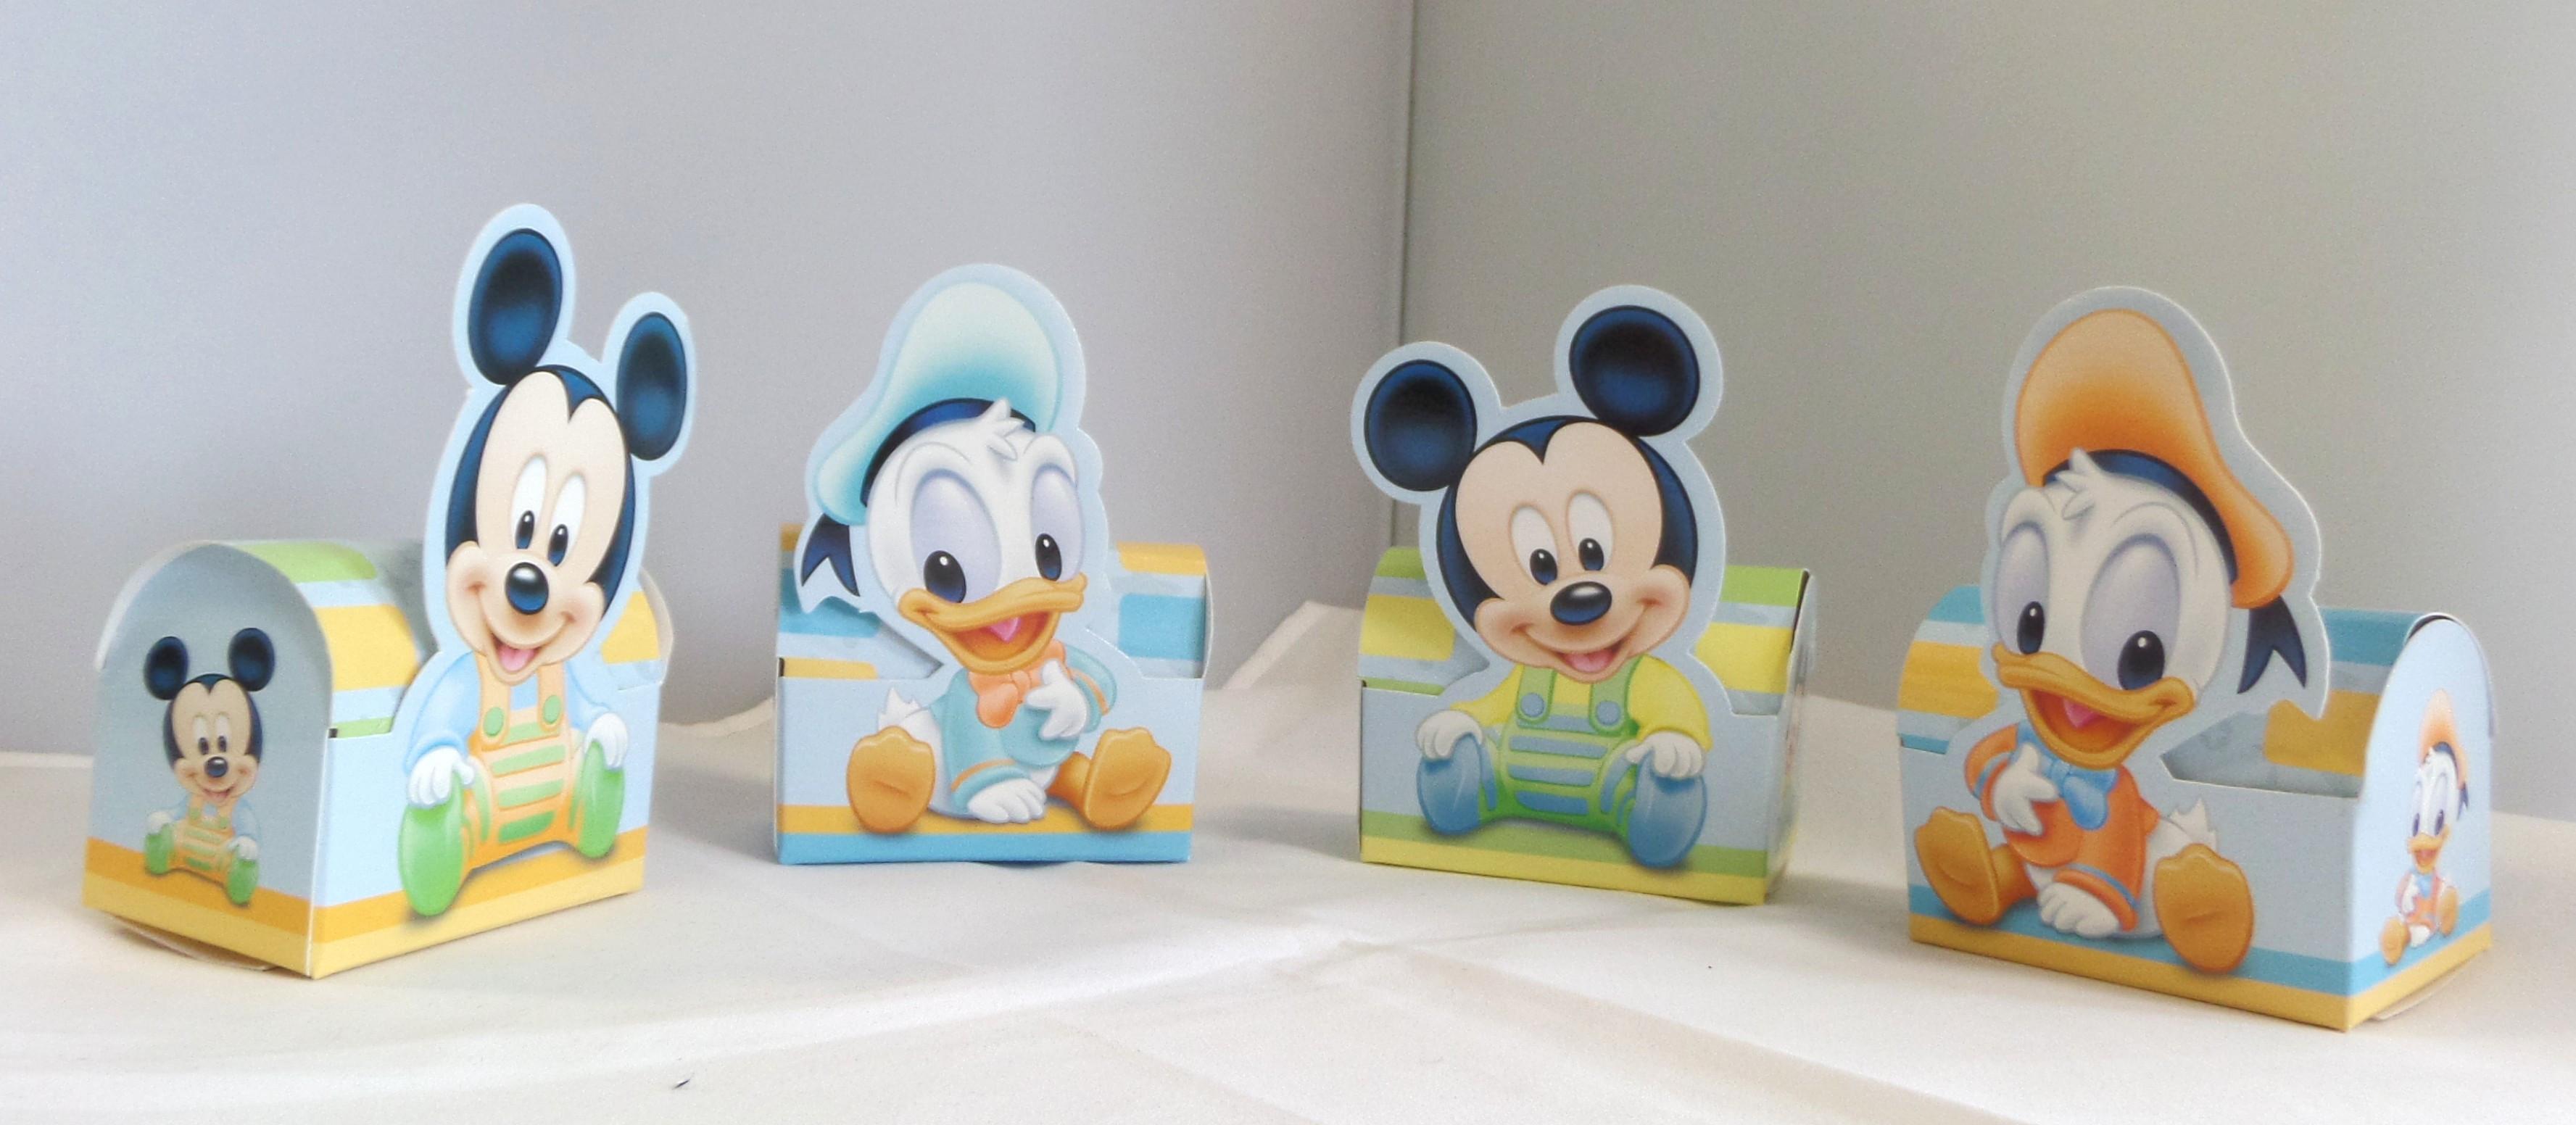 10 boites drag es mickey et donald baby dimensions mont es environ 7 x 10 x 4 cm prix bas - Decoration bapteme theme mickey ...